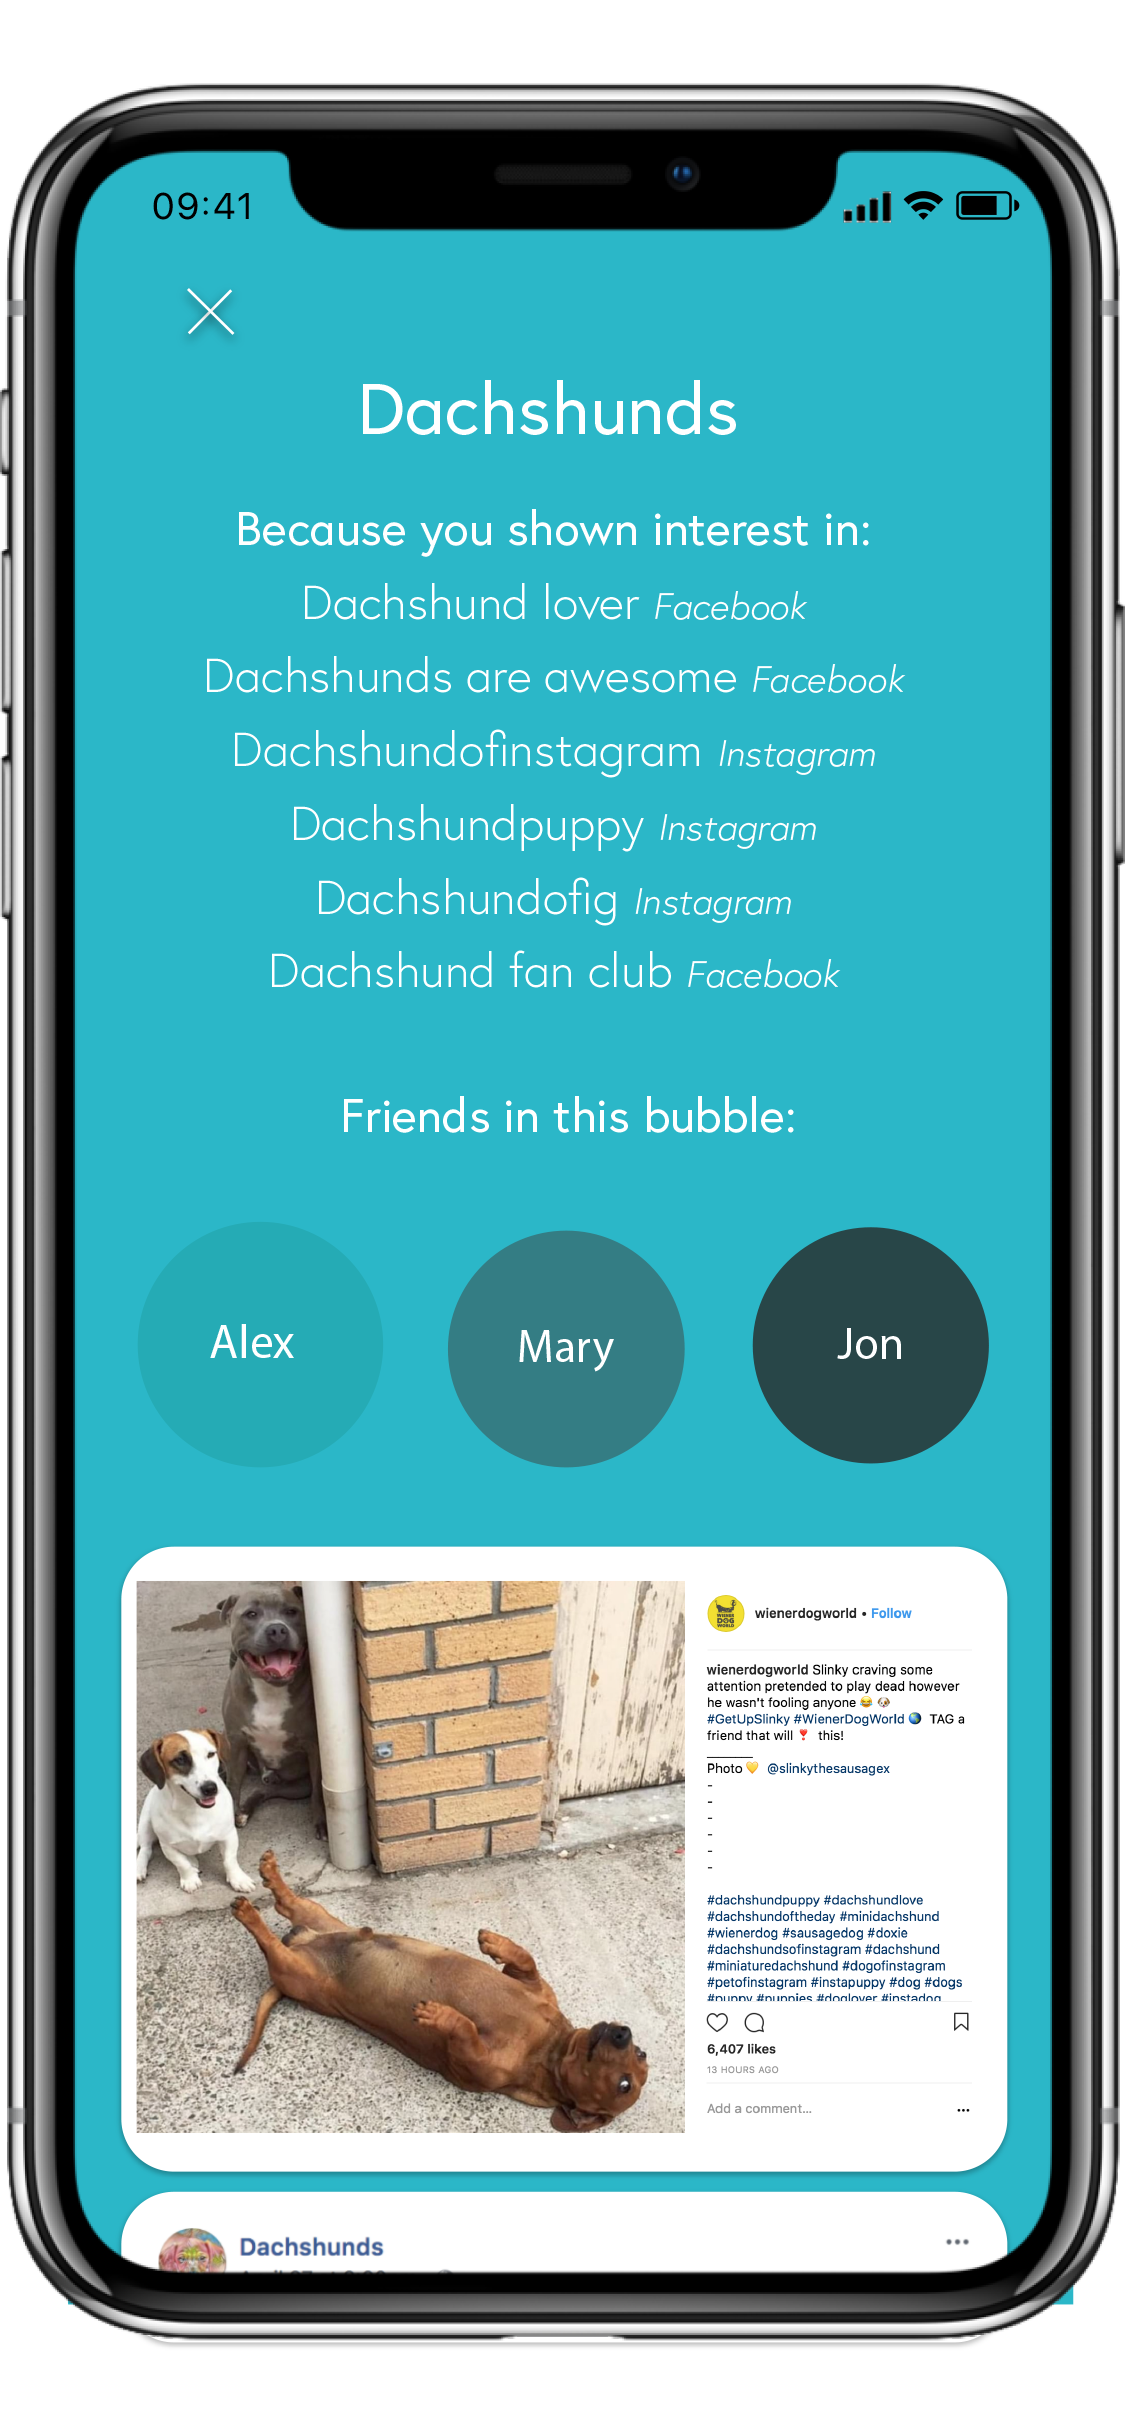 Dachshunds' bubble